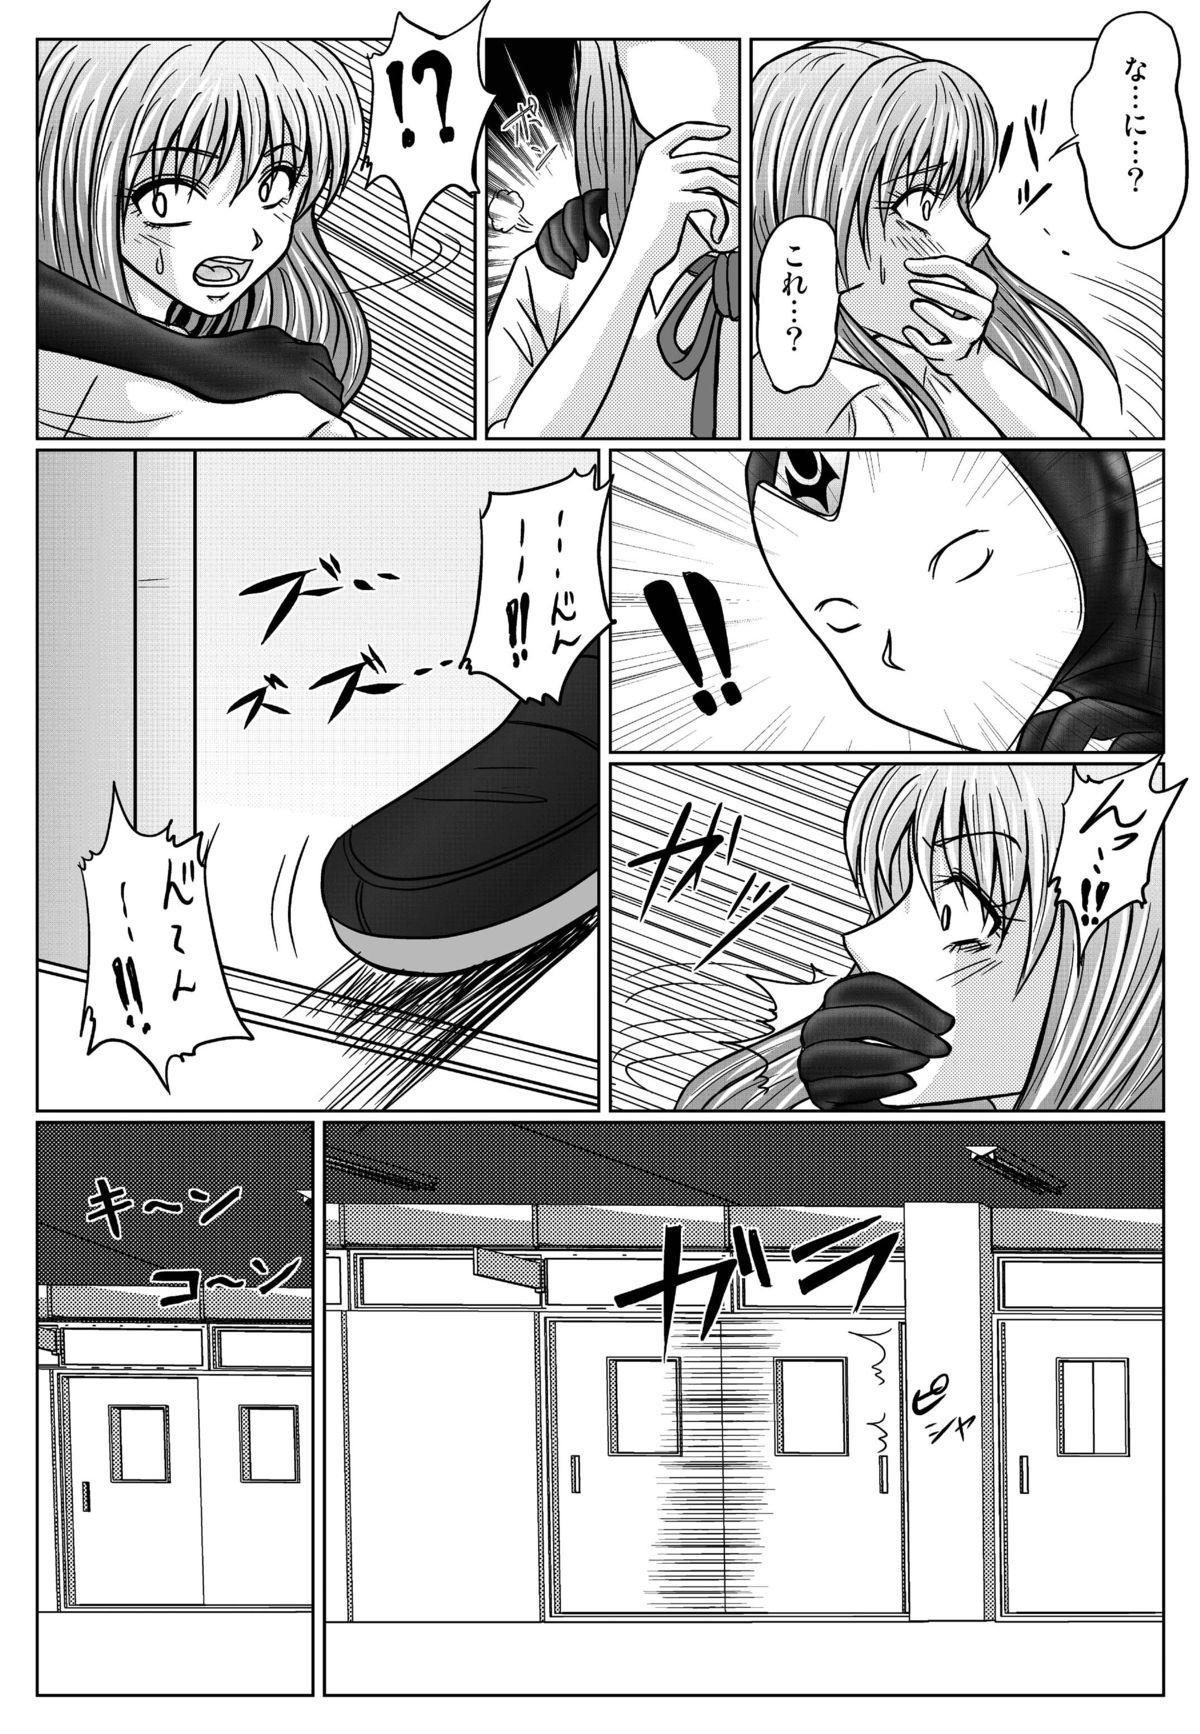 [Macxe's (monmon)] Tokubousentai Dinaranger ~Heroine Kairaku Sennou Keikaku~ Vol.01/02/03 (Renkaban) [Digital] 72